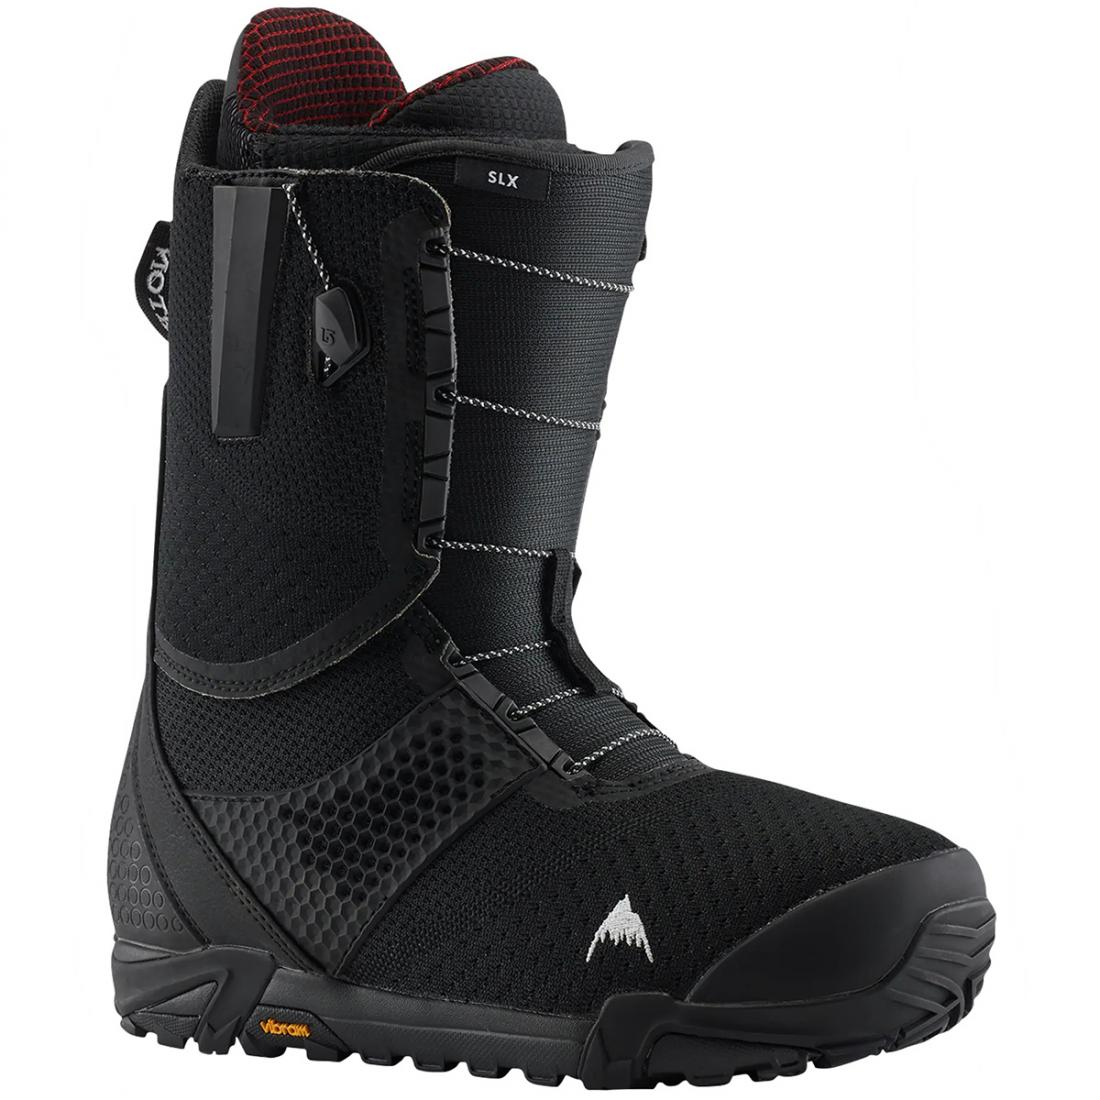 Ботинки для сноуборда SLX фото